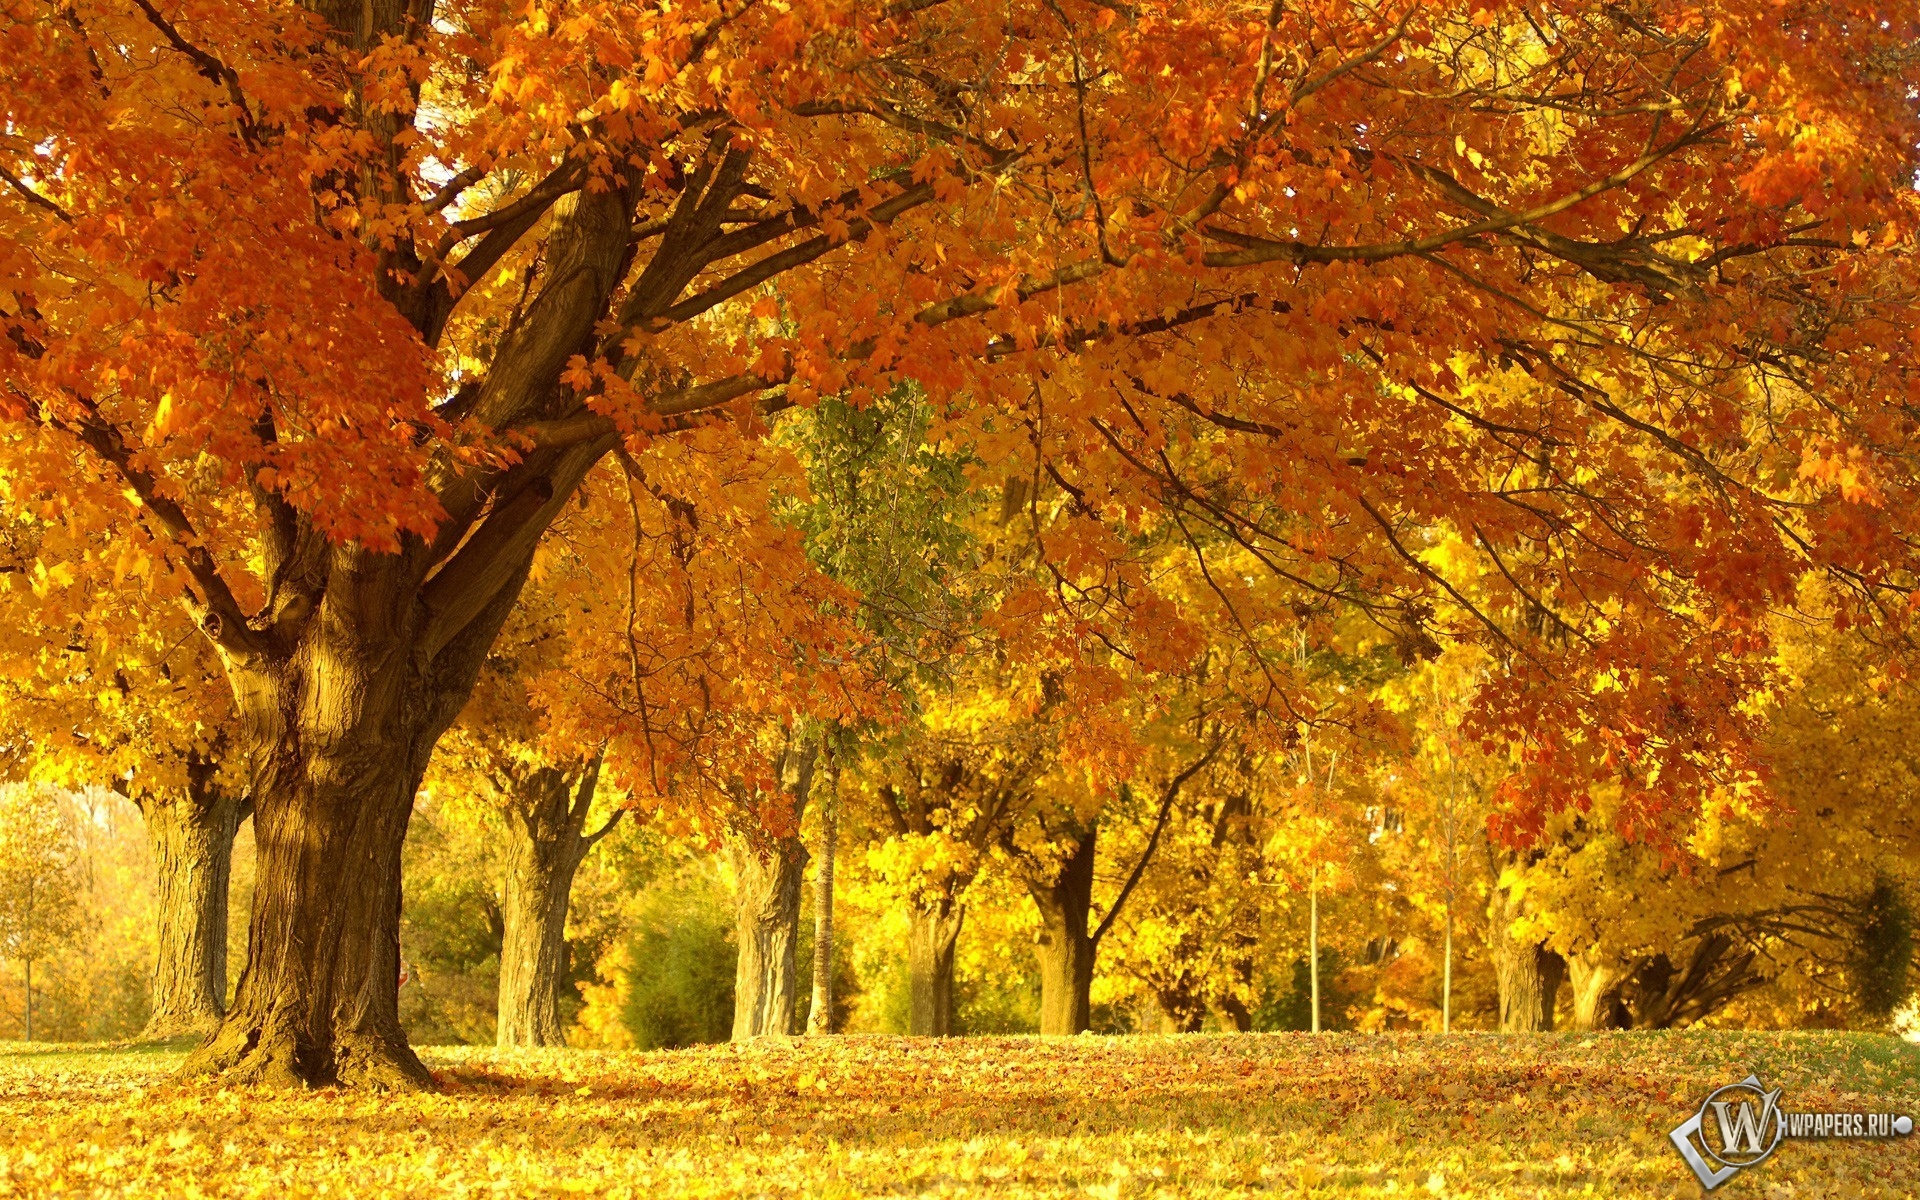 Осенняя аллея лес деревья природа